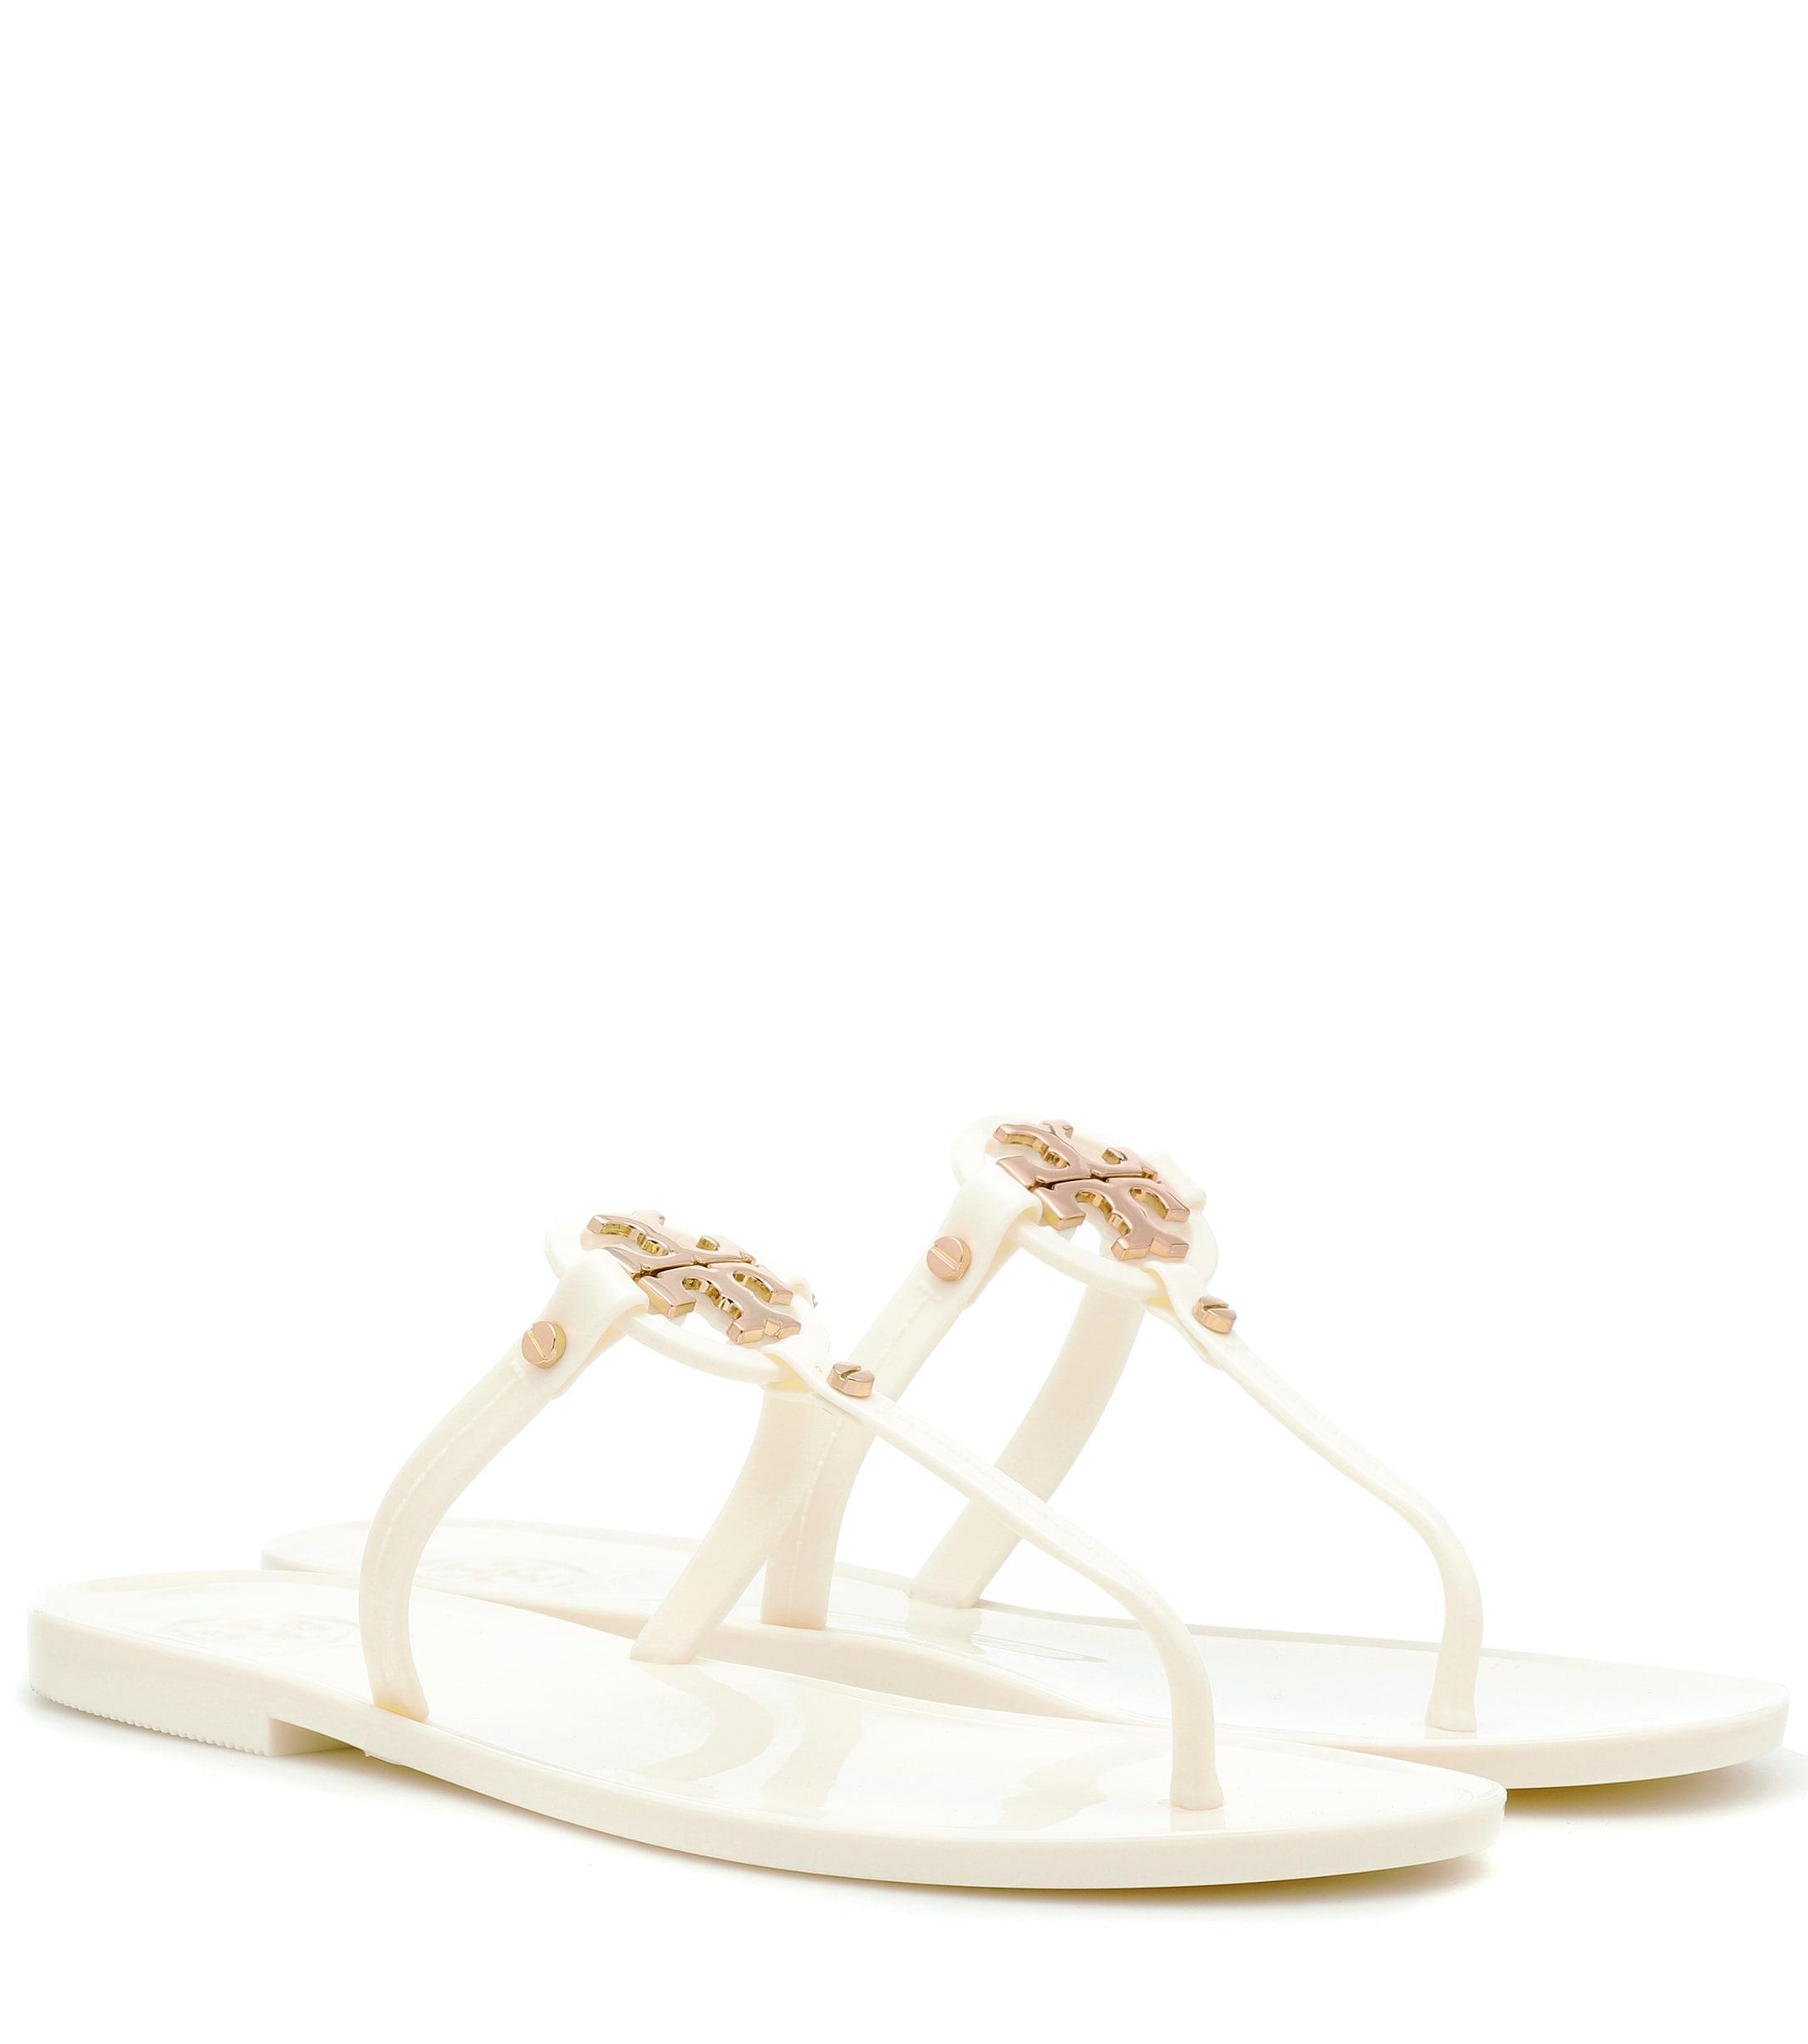 082bcb97331401 Lyst - Tory Burch Mini Miller Jelly Sandals in White